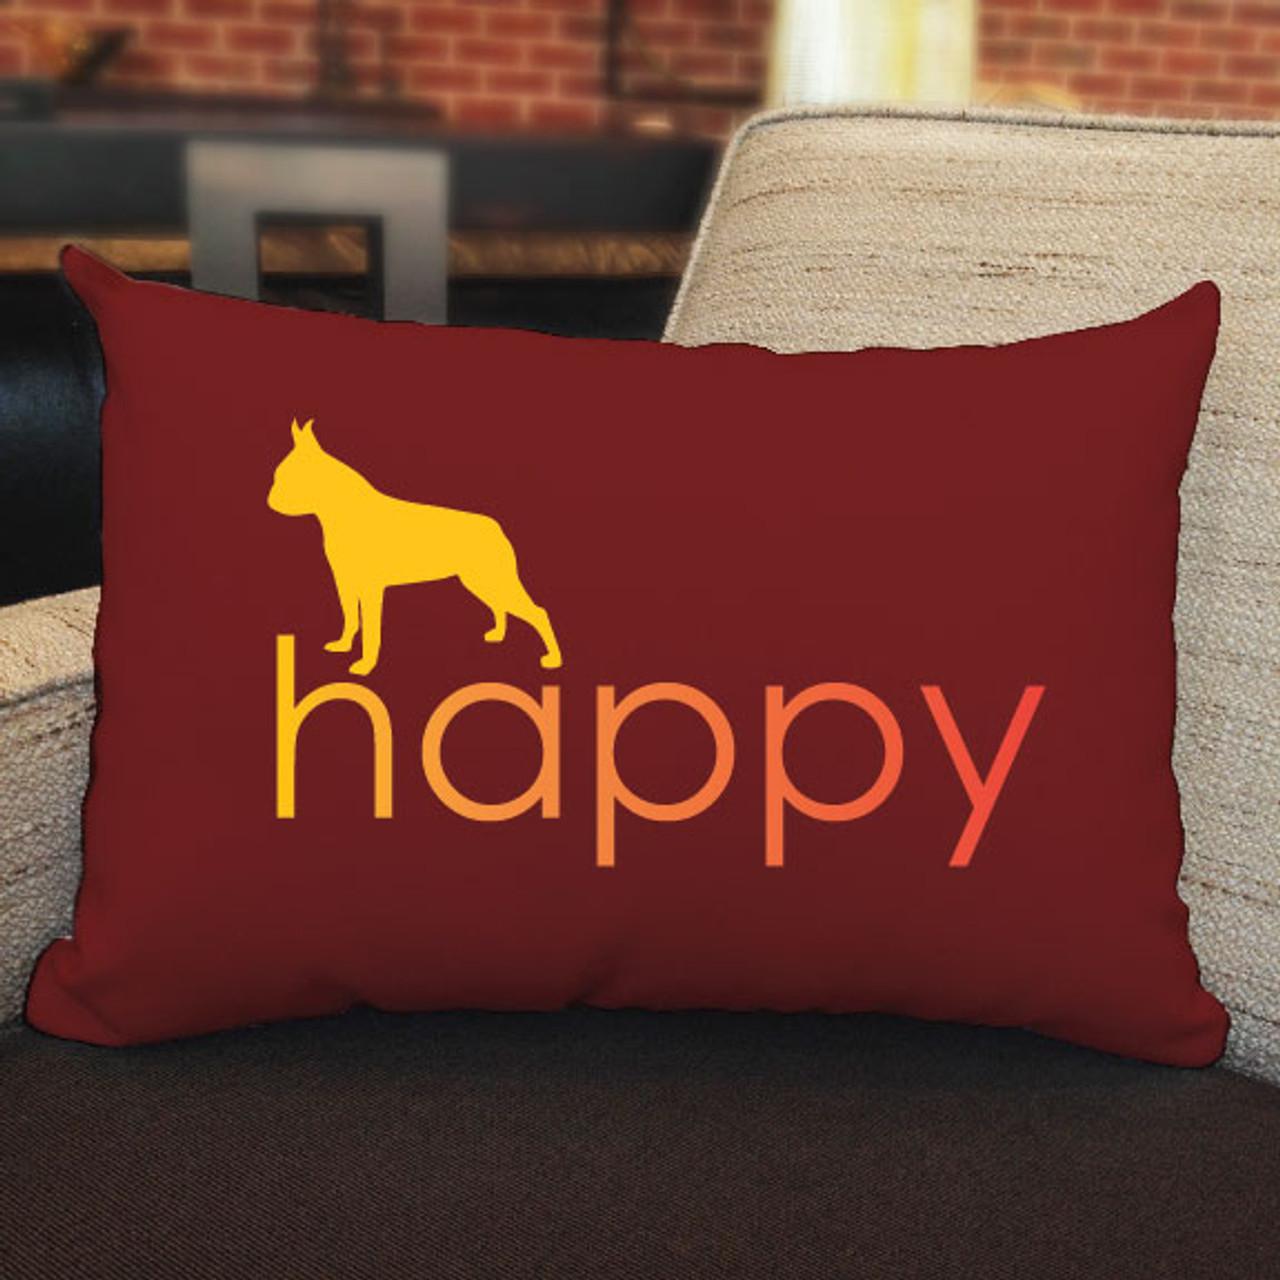 axd decor harbor pillows home pillow silk boston accessories